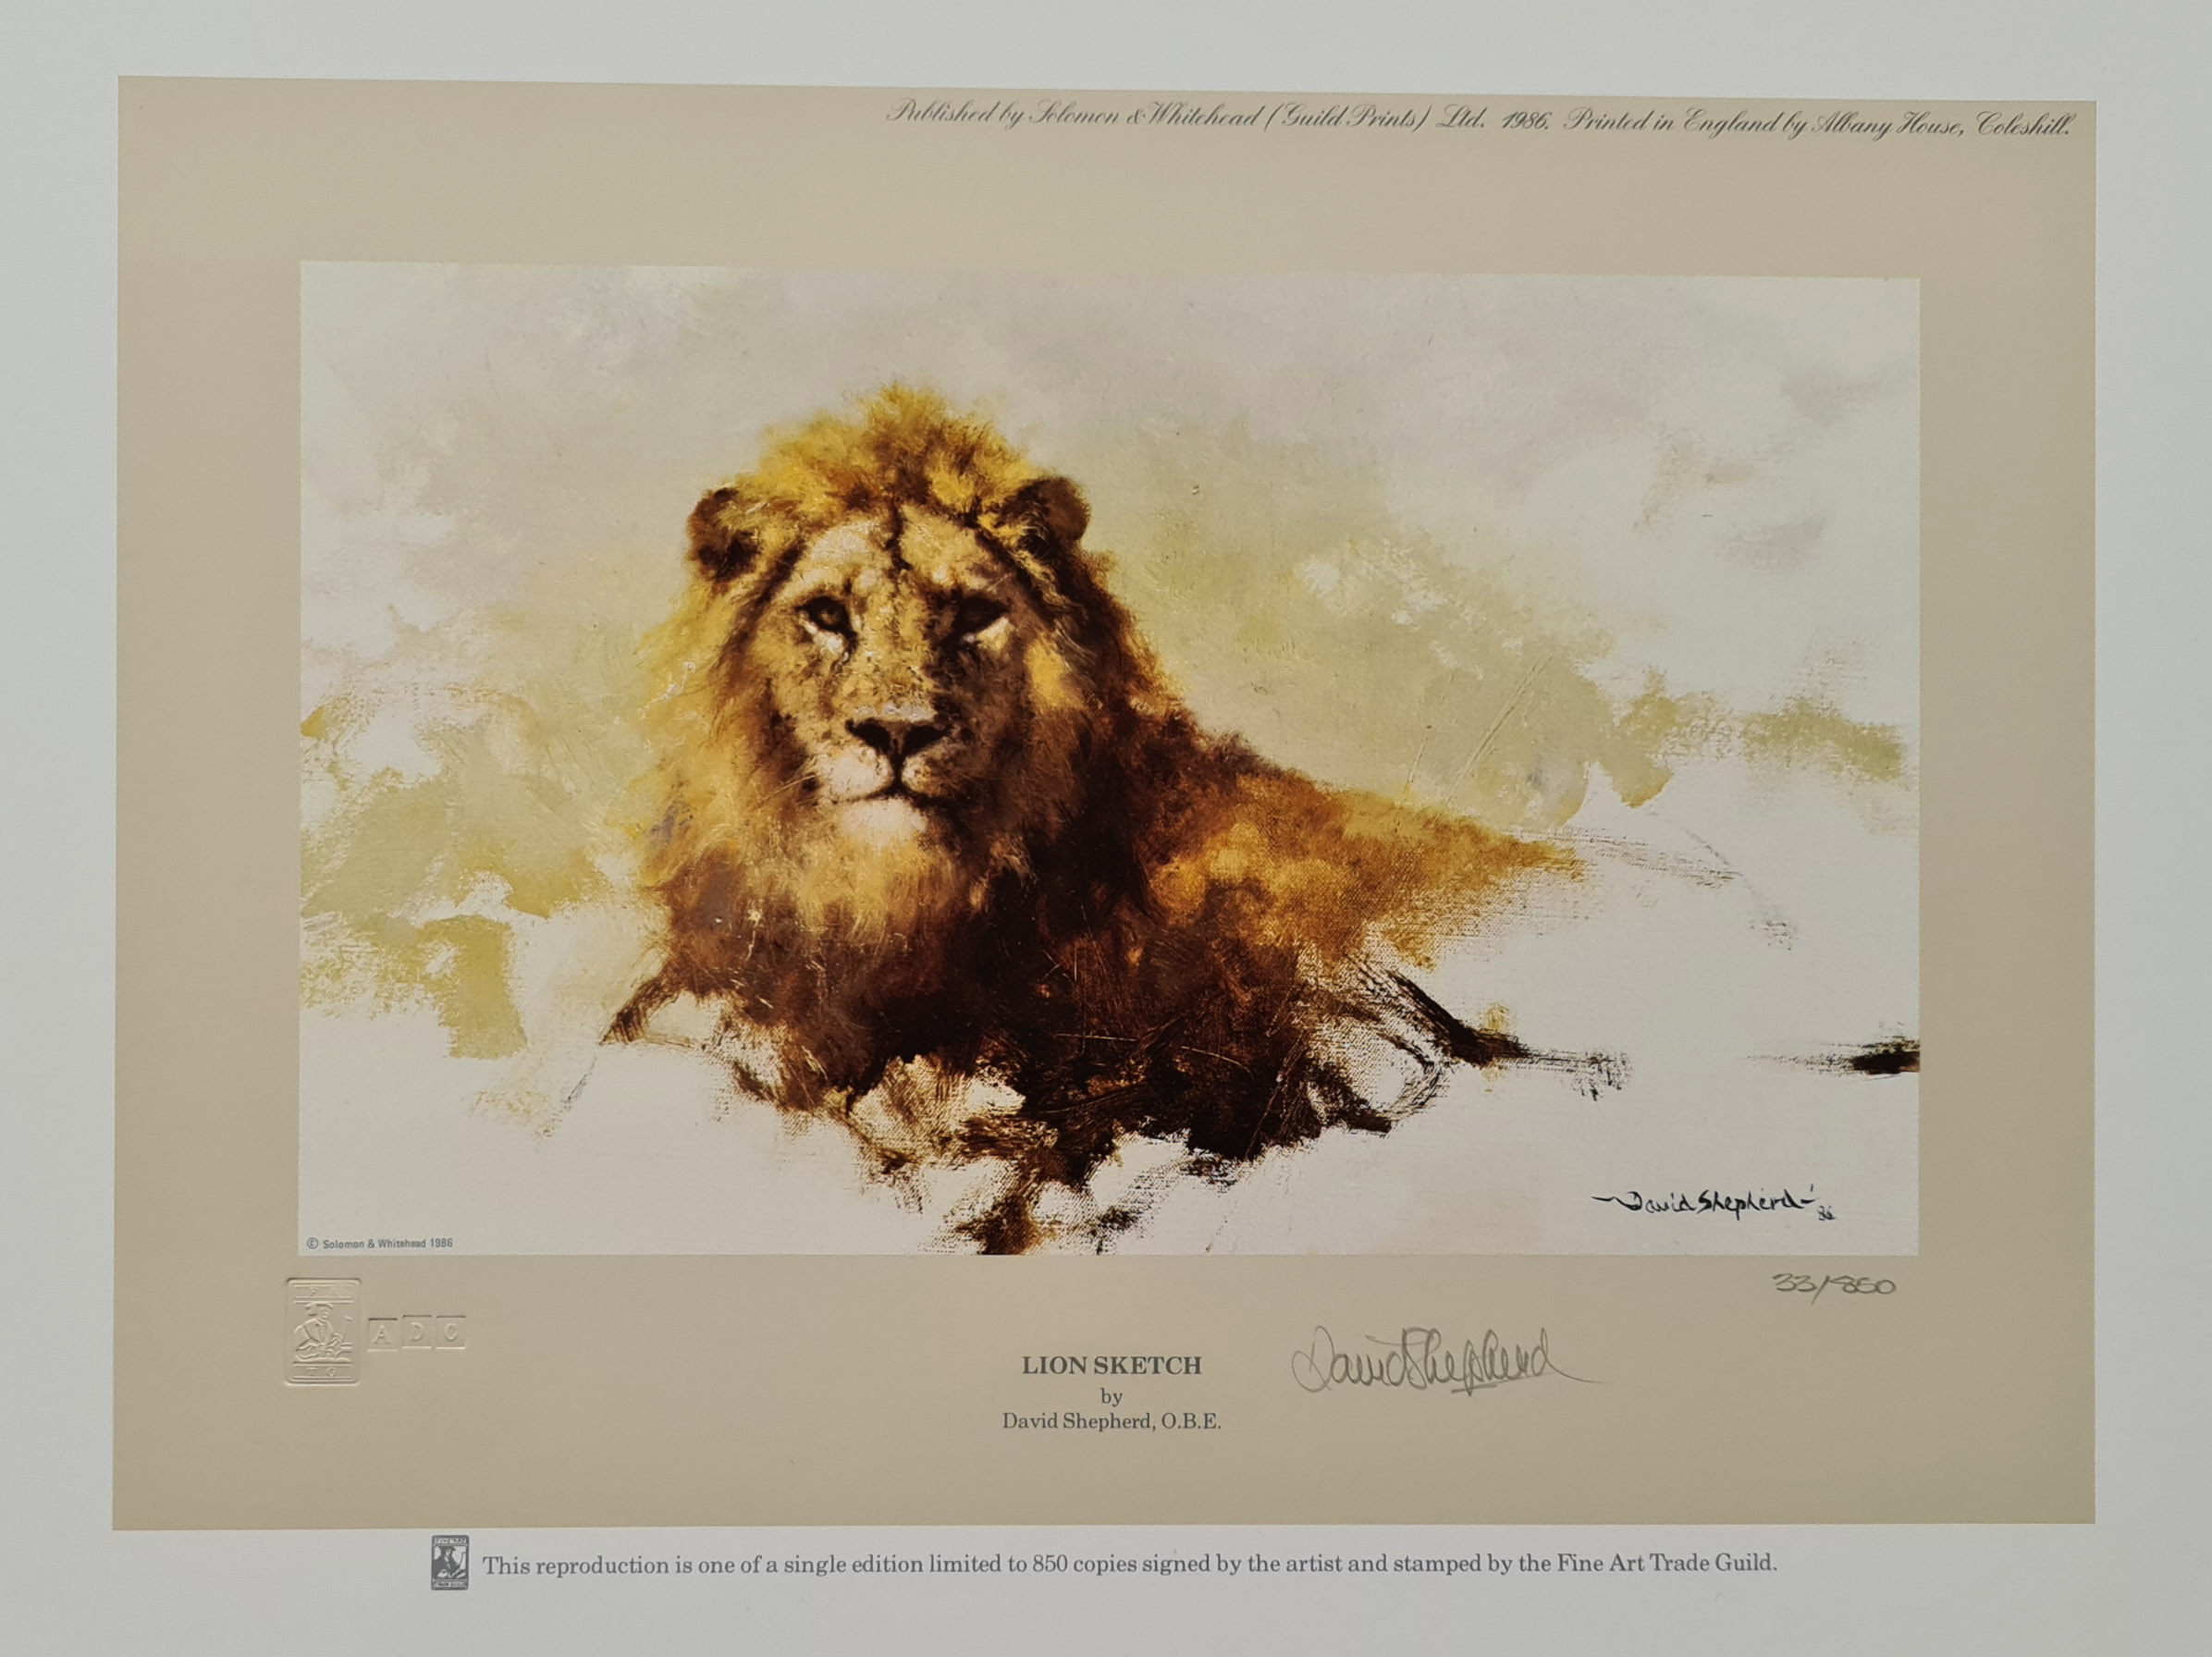 david shepherd, lion sketch